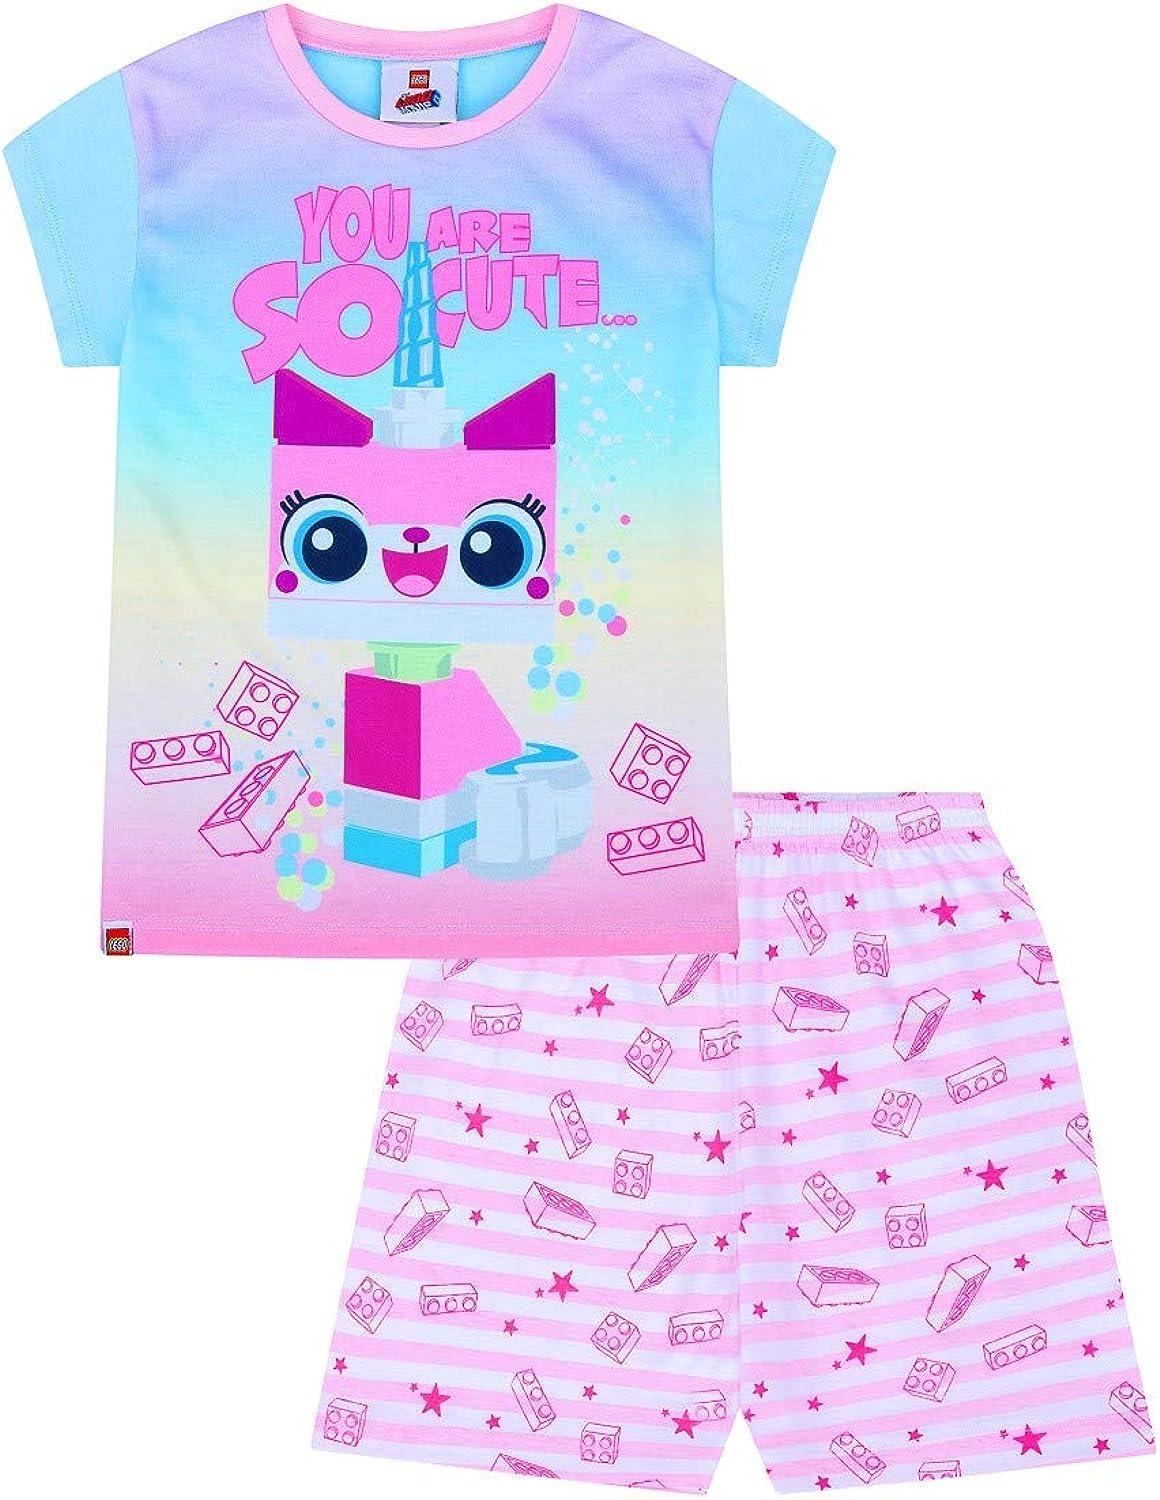 Official Unikitty You are So Cute Short Pink Pyjamas Pj Girls Pjs 5-6 Years